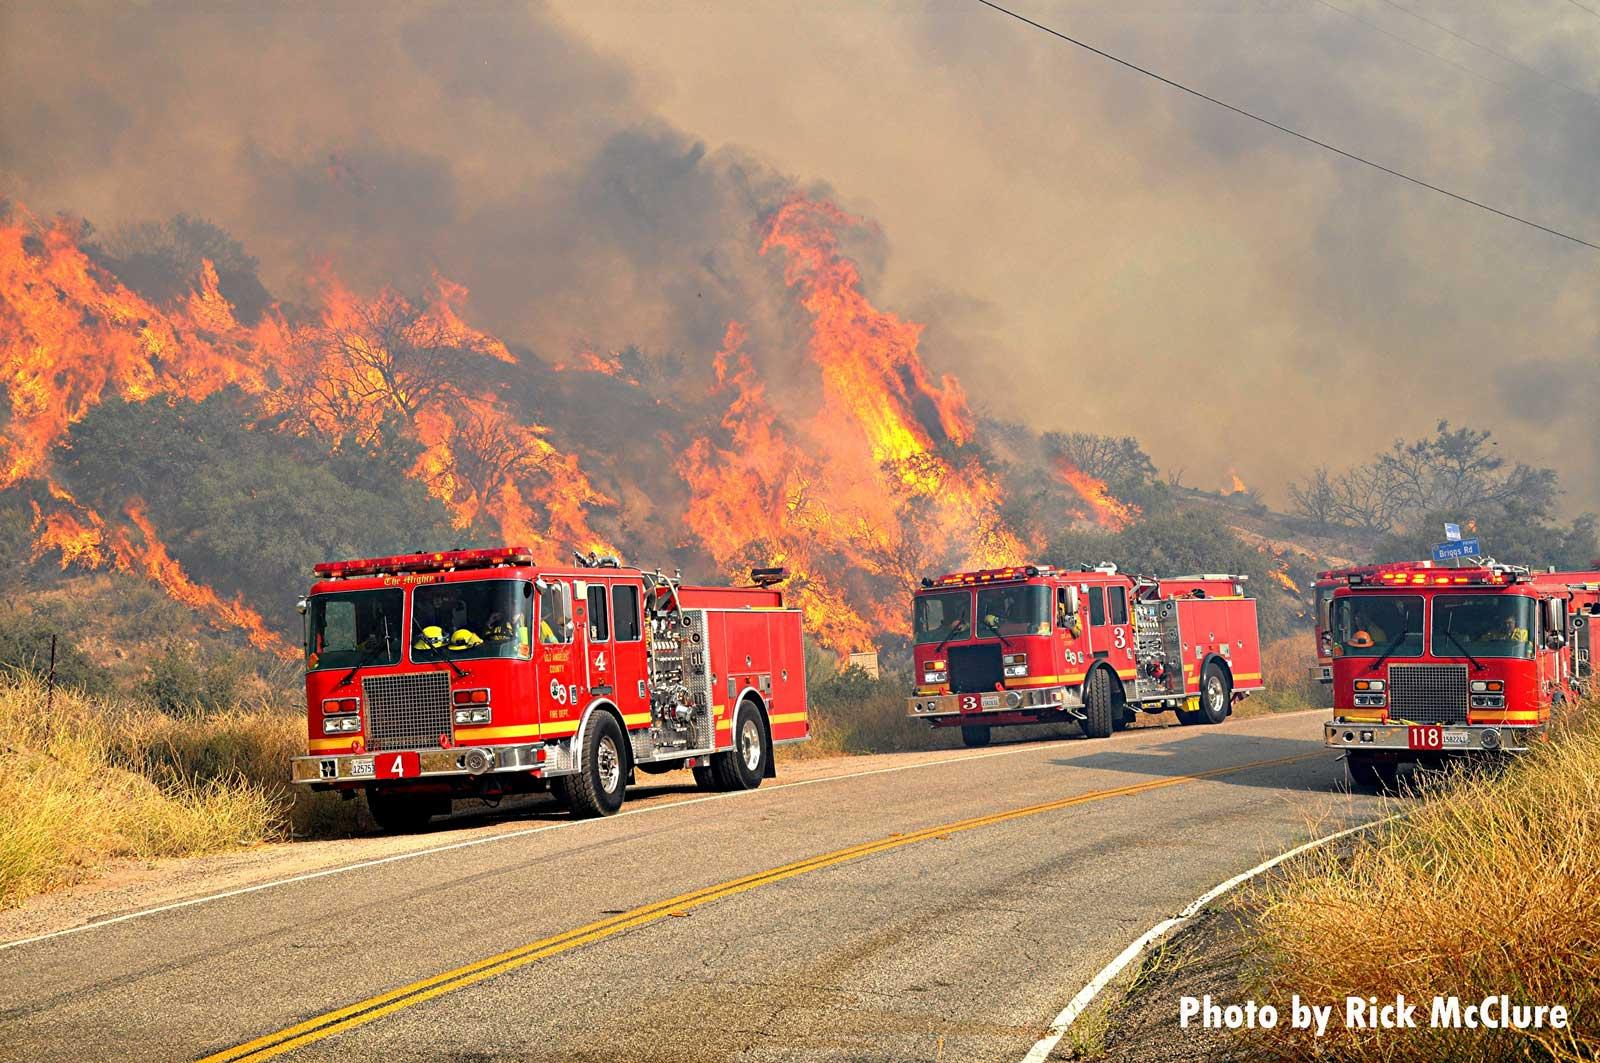 Fire trucks near wildland fire in California